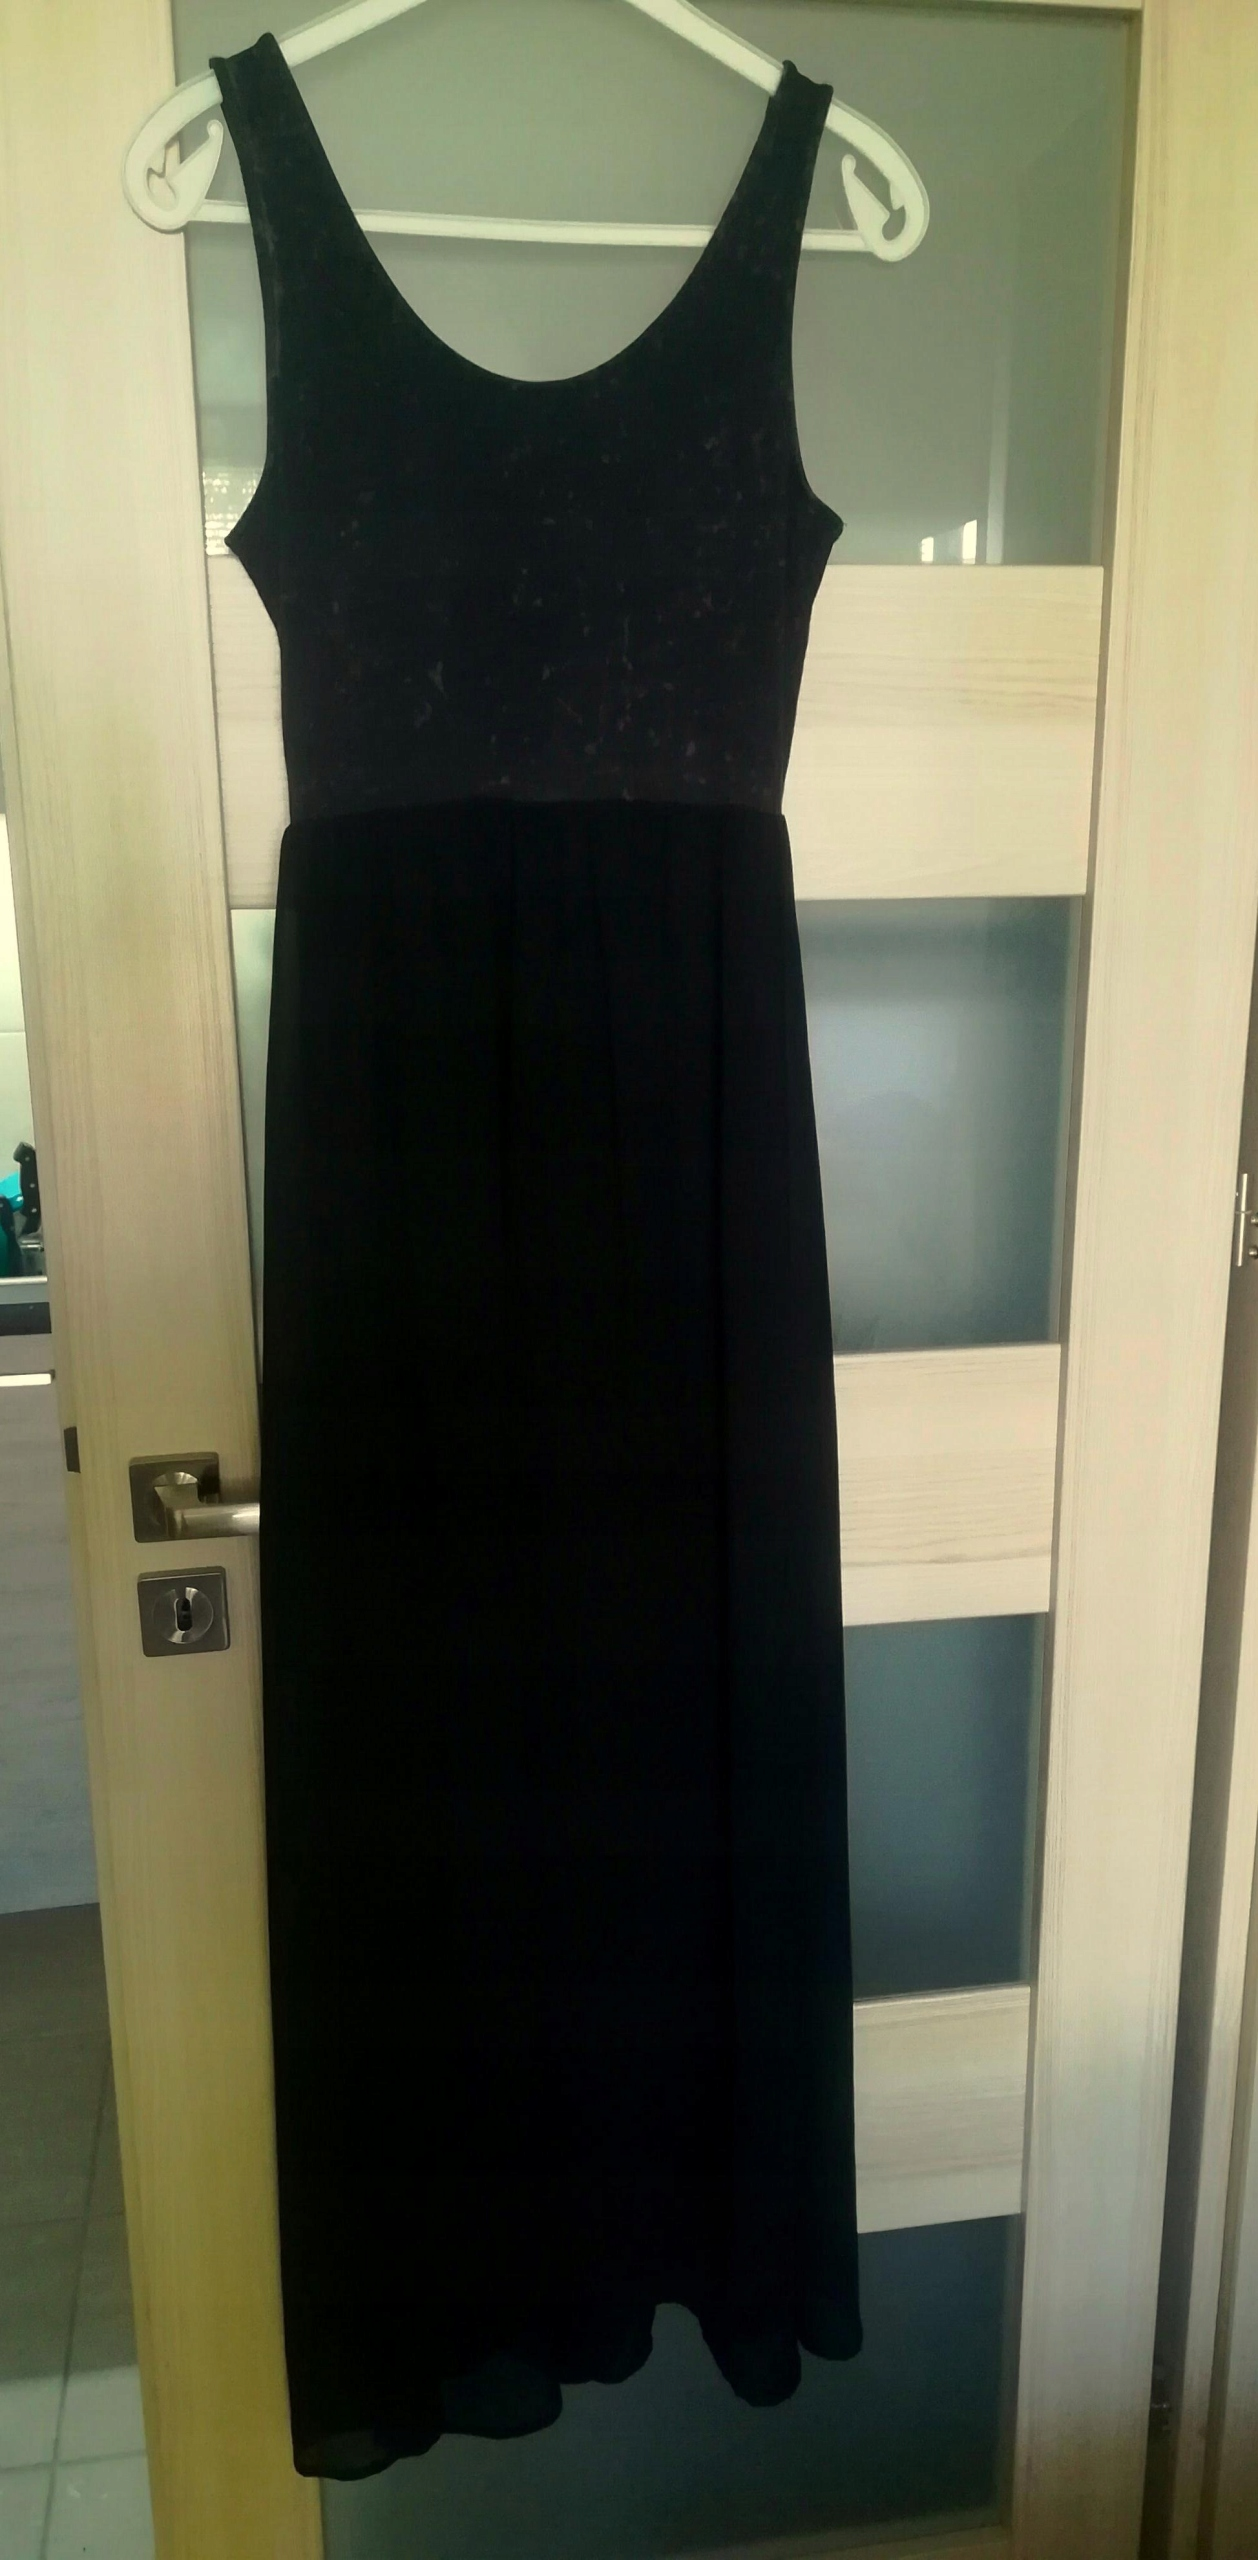 41d2f94c7d czarna sukienka długa maxi H M r.38 - 7496151661 - oficjalne ...